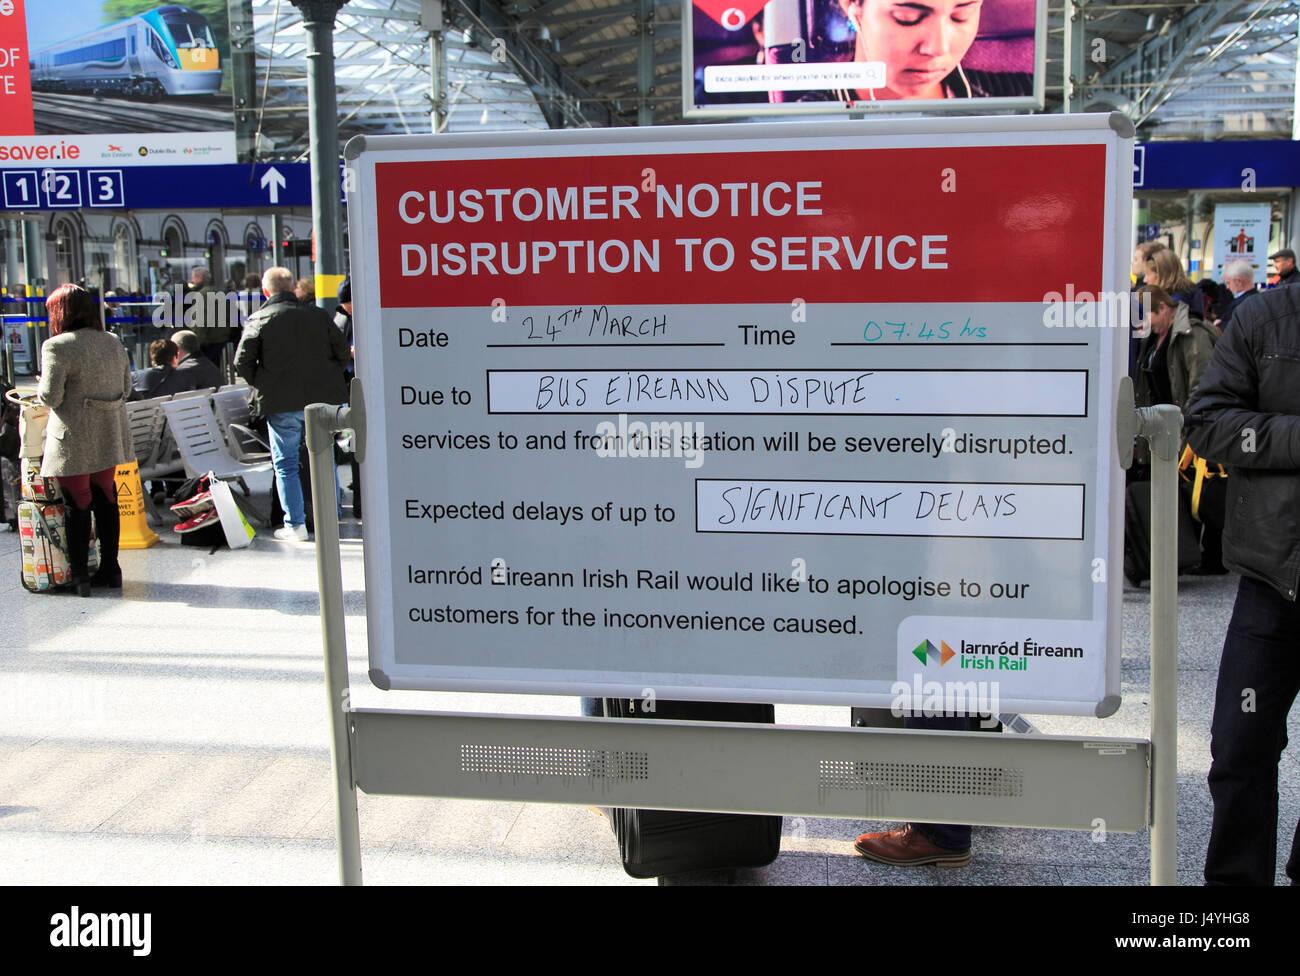 Bus Eireann industrial dispute travel disruption notice at Heuston railway station building, Dublin, Ireland, - Stock Image